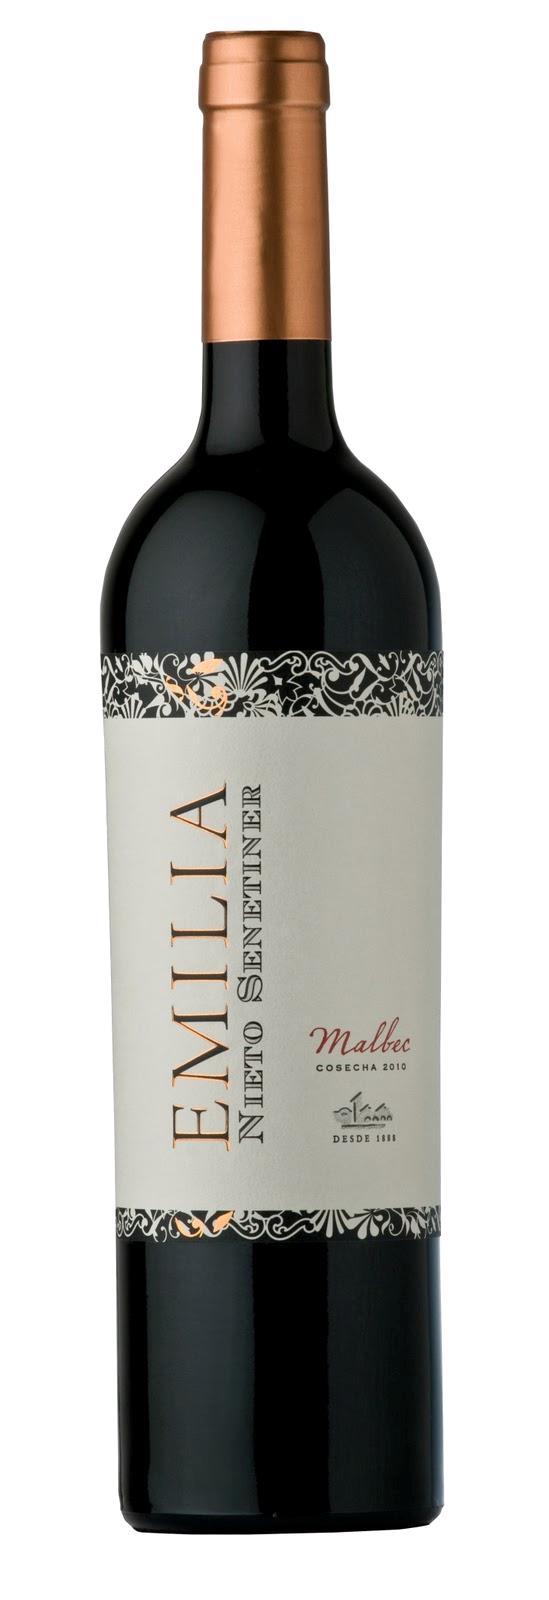 Emilia Malbec 6x750cc